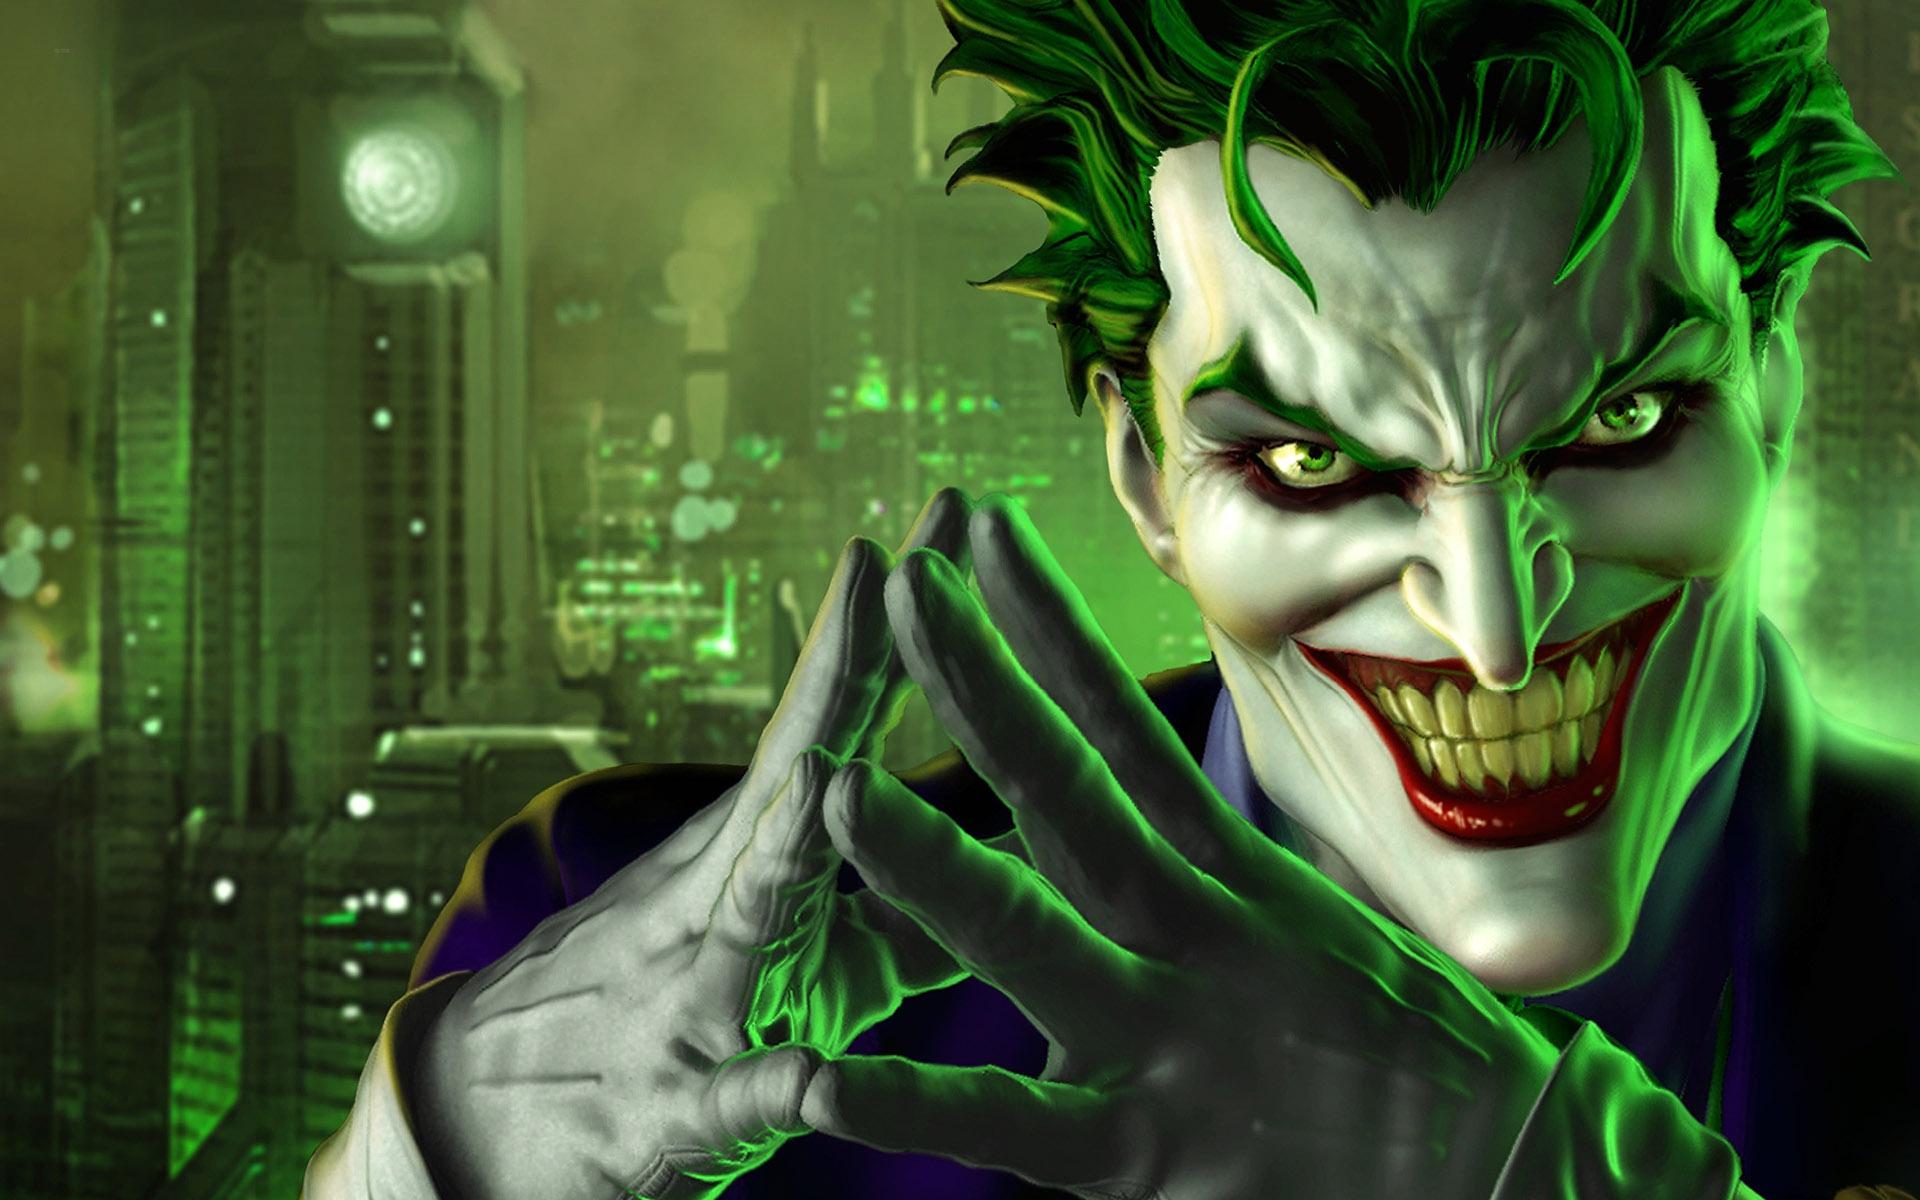 The Joker Cartoon Wallpaper Sf Wallpaper